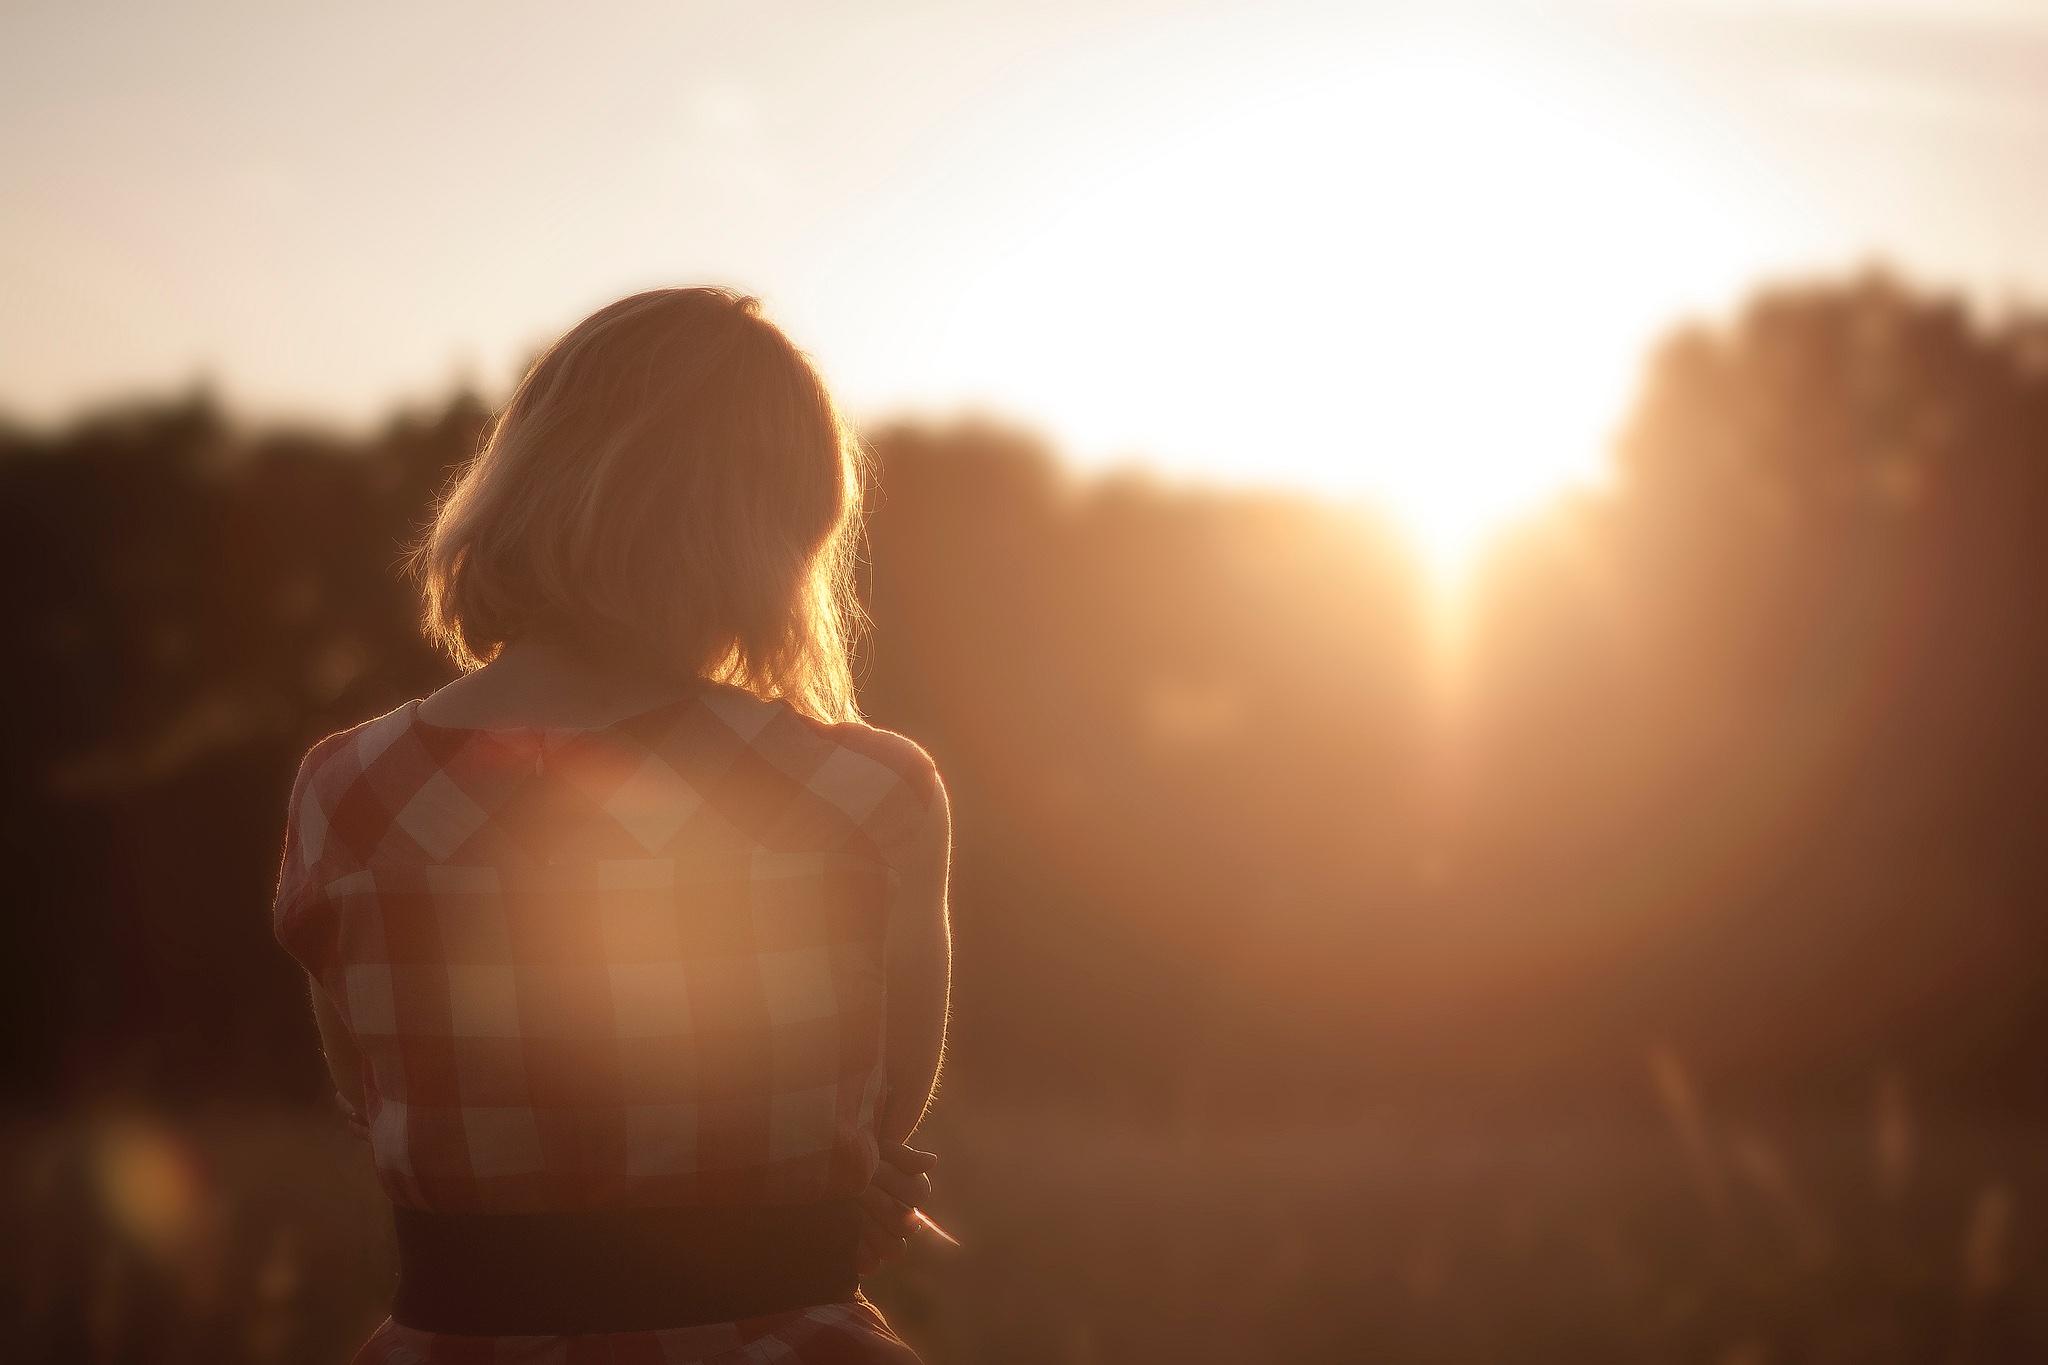 Photo by Sunset Girl via Unsplash